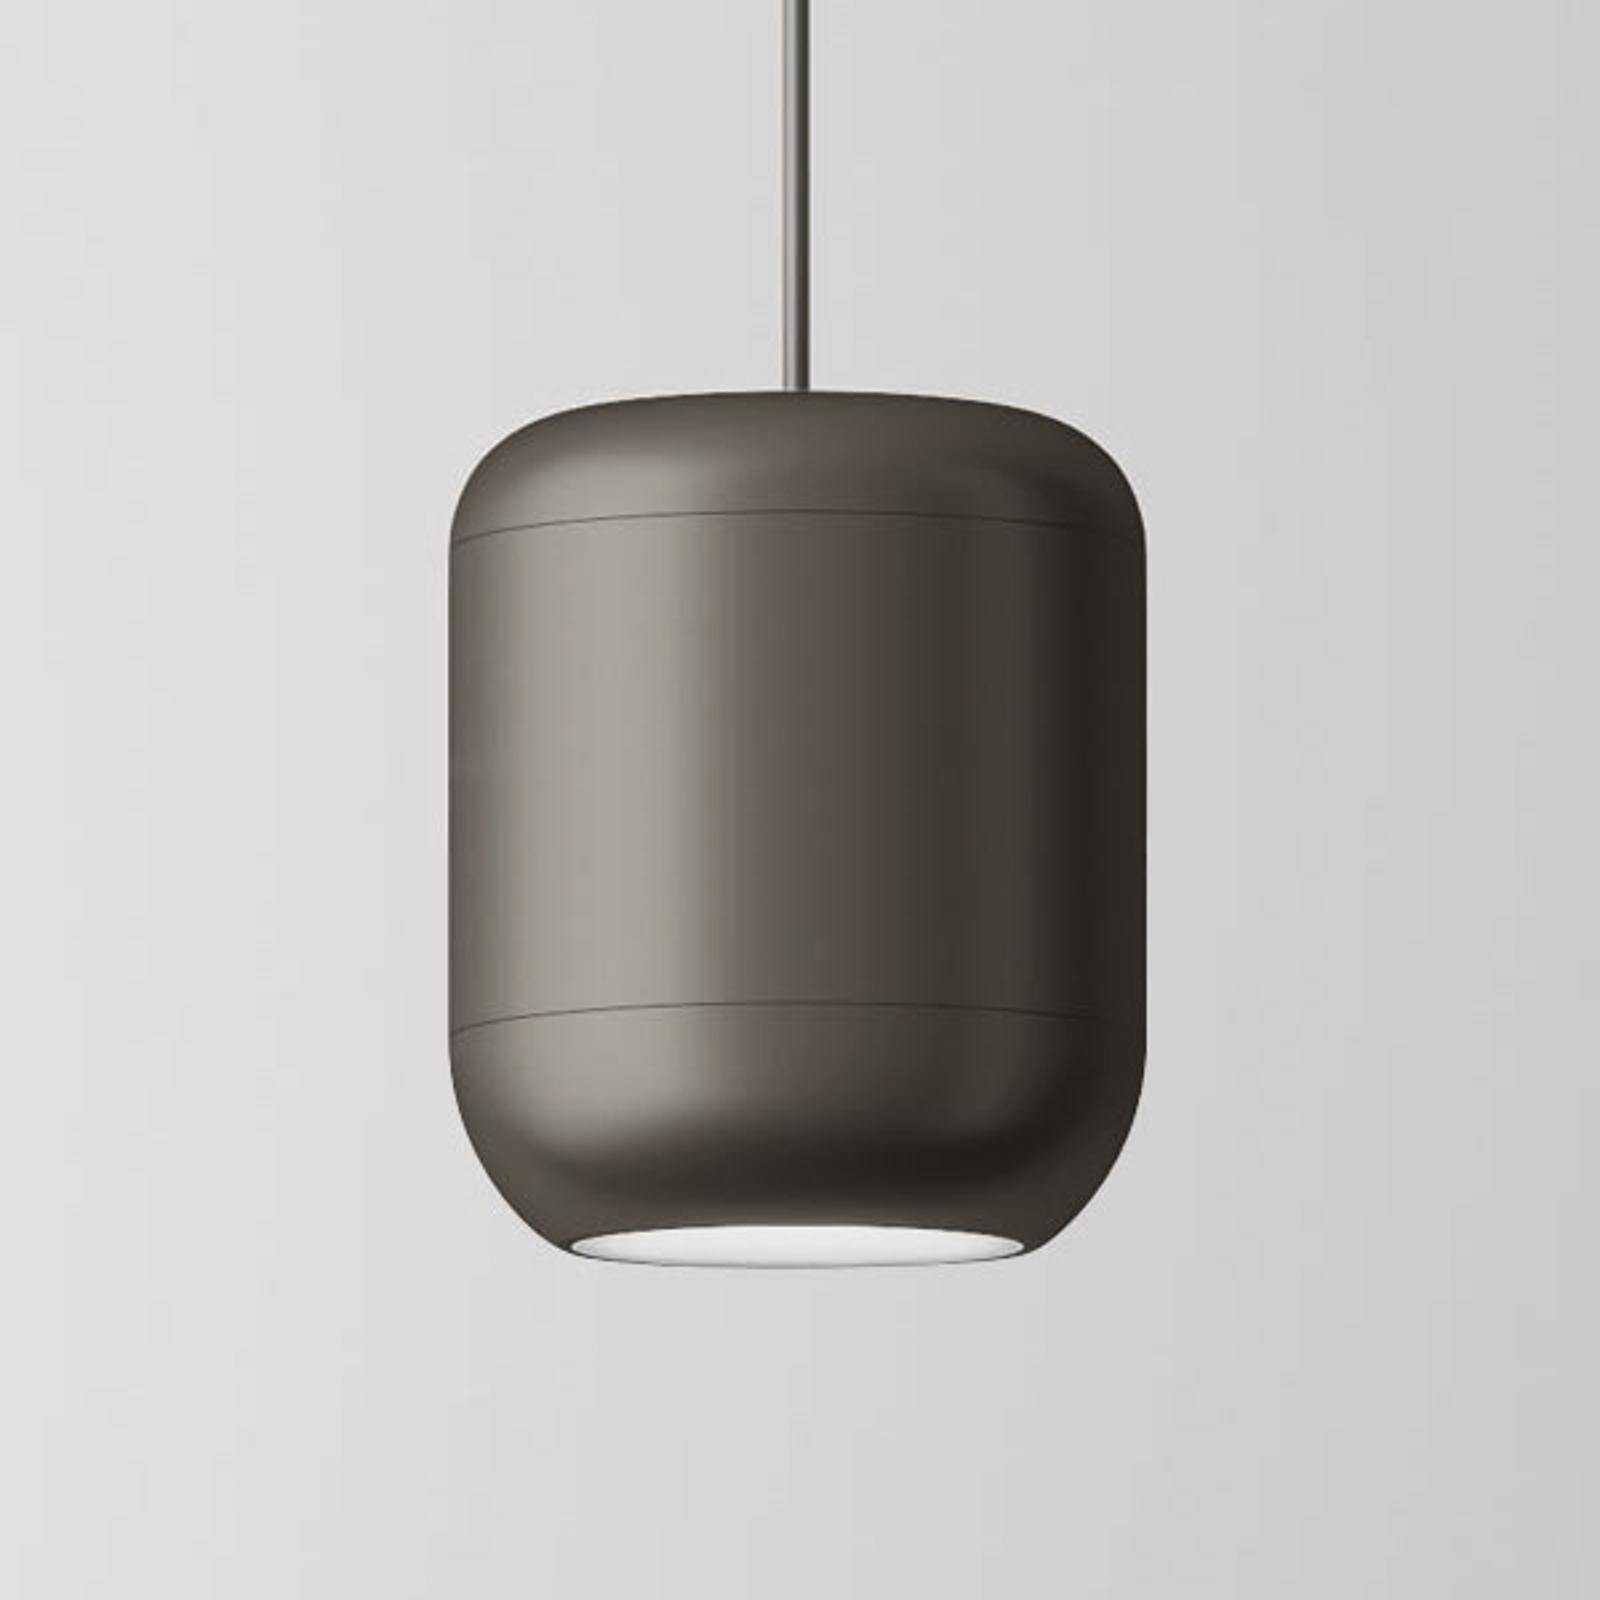 Axolight Urban sospensione LED 26 cm, nichel